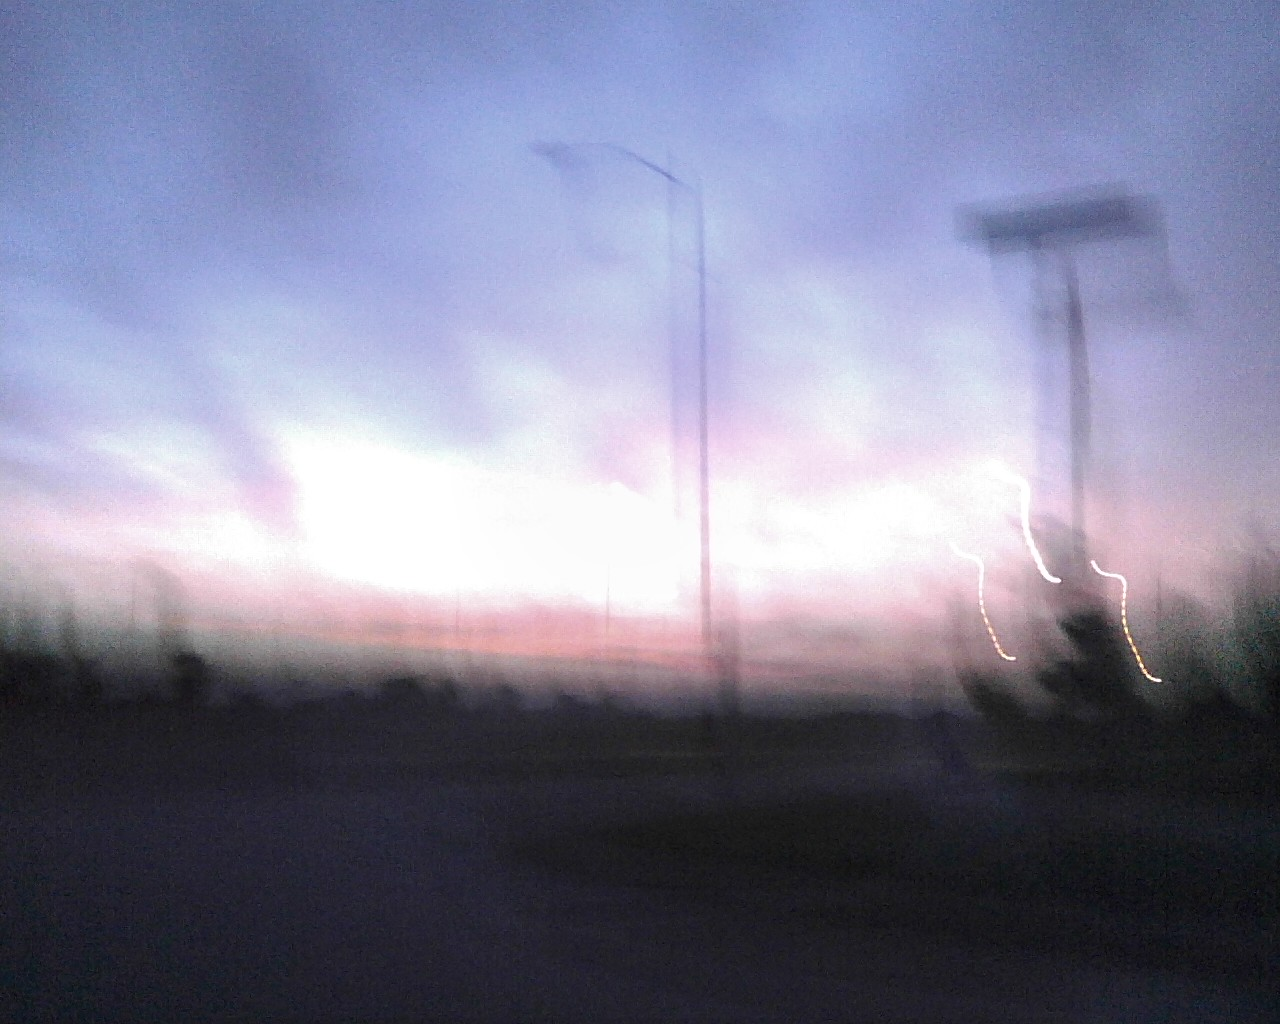 Sky - Photo04220633.jpg